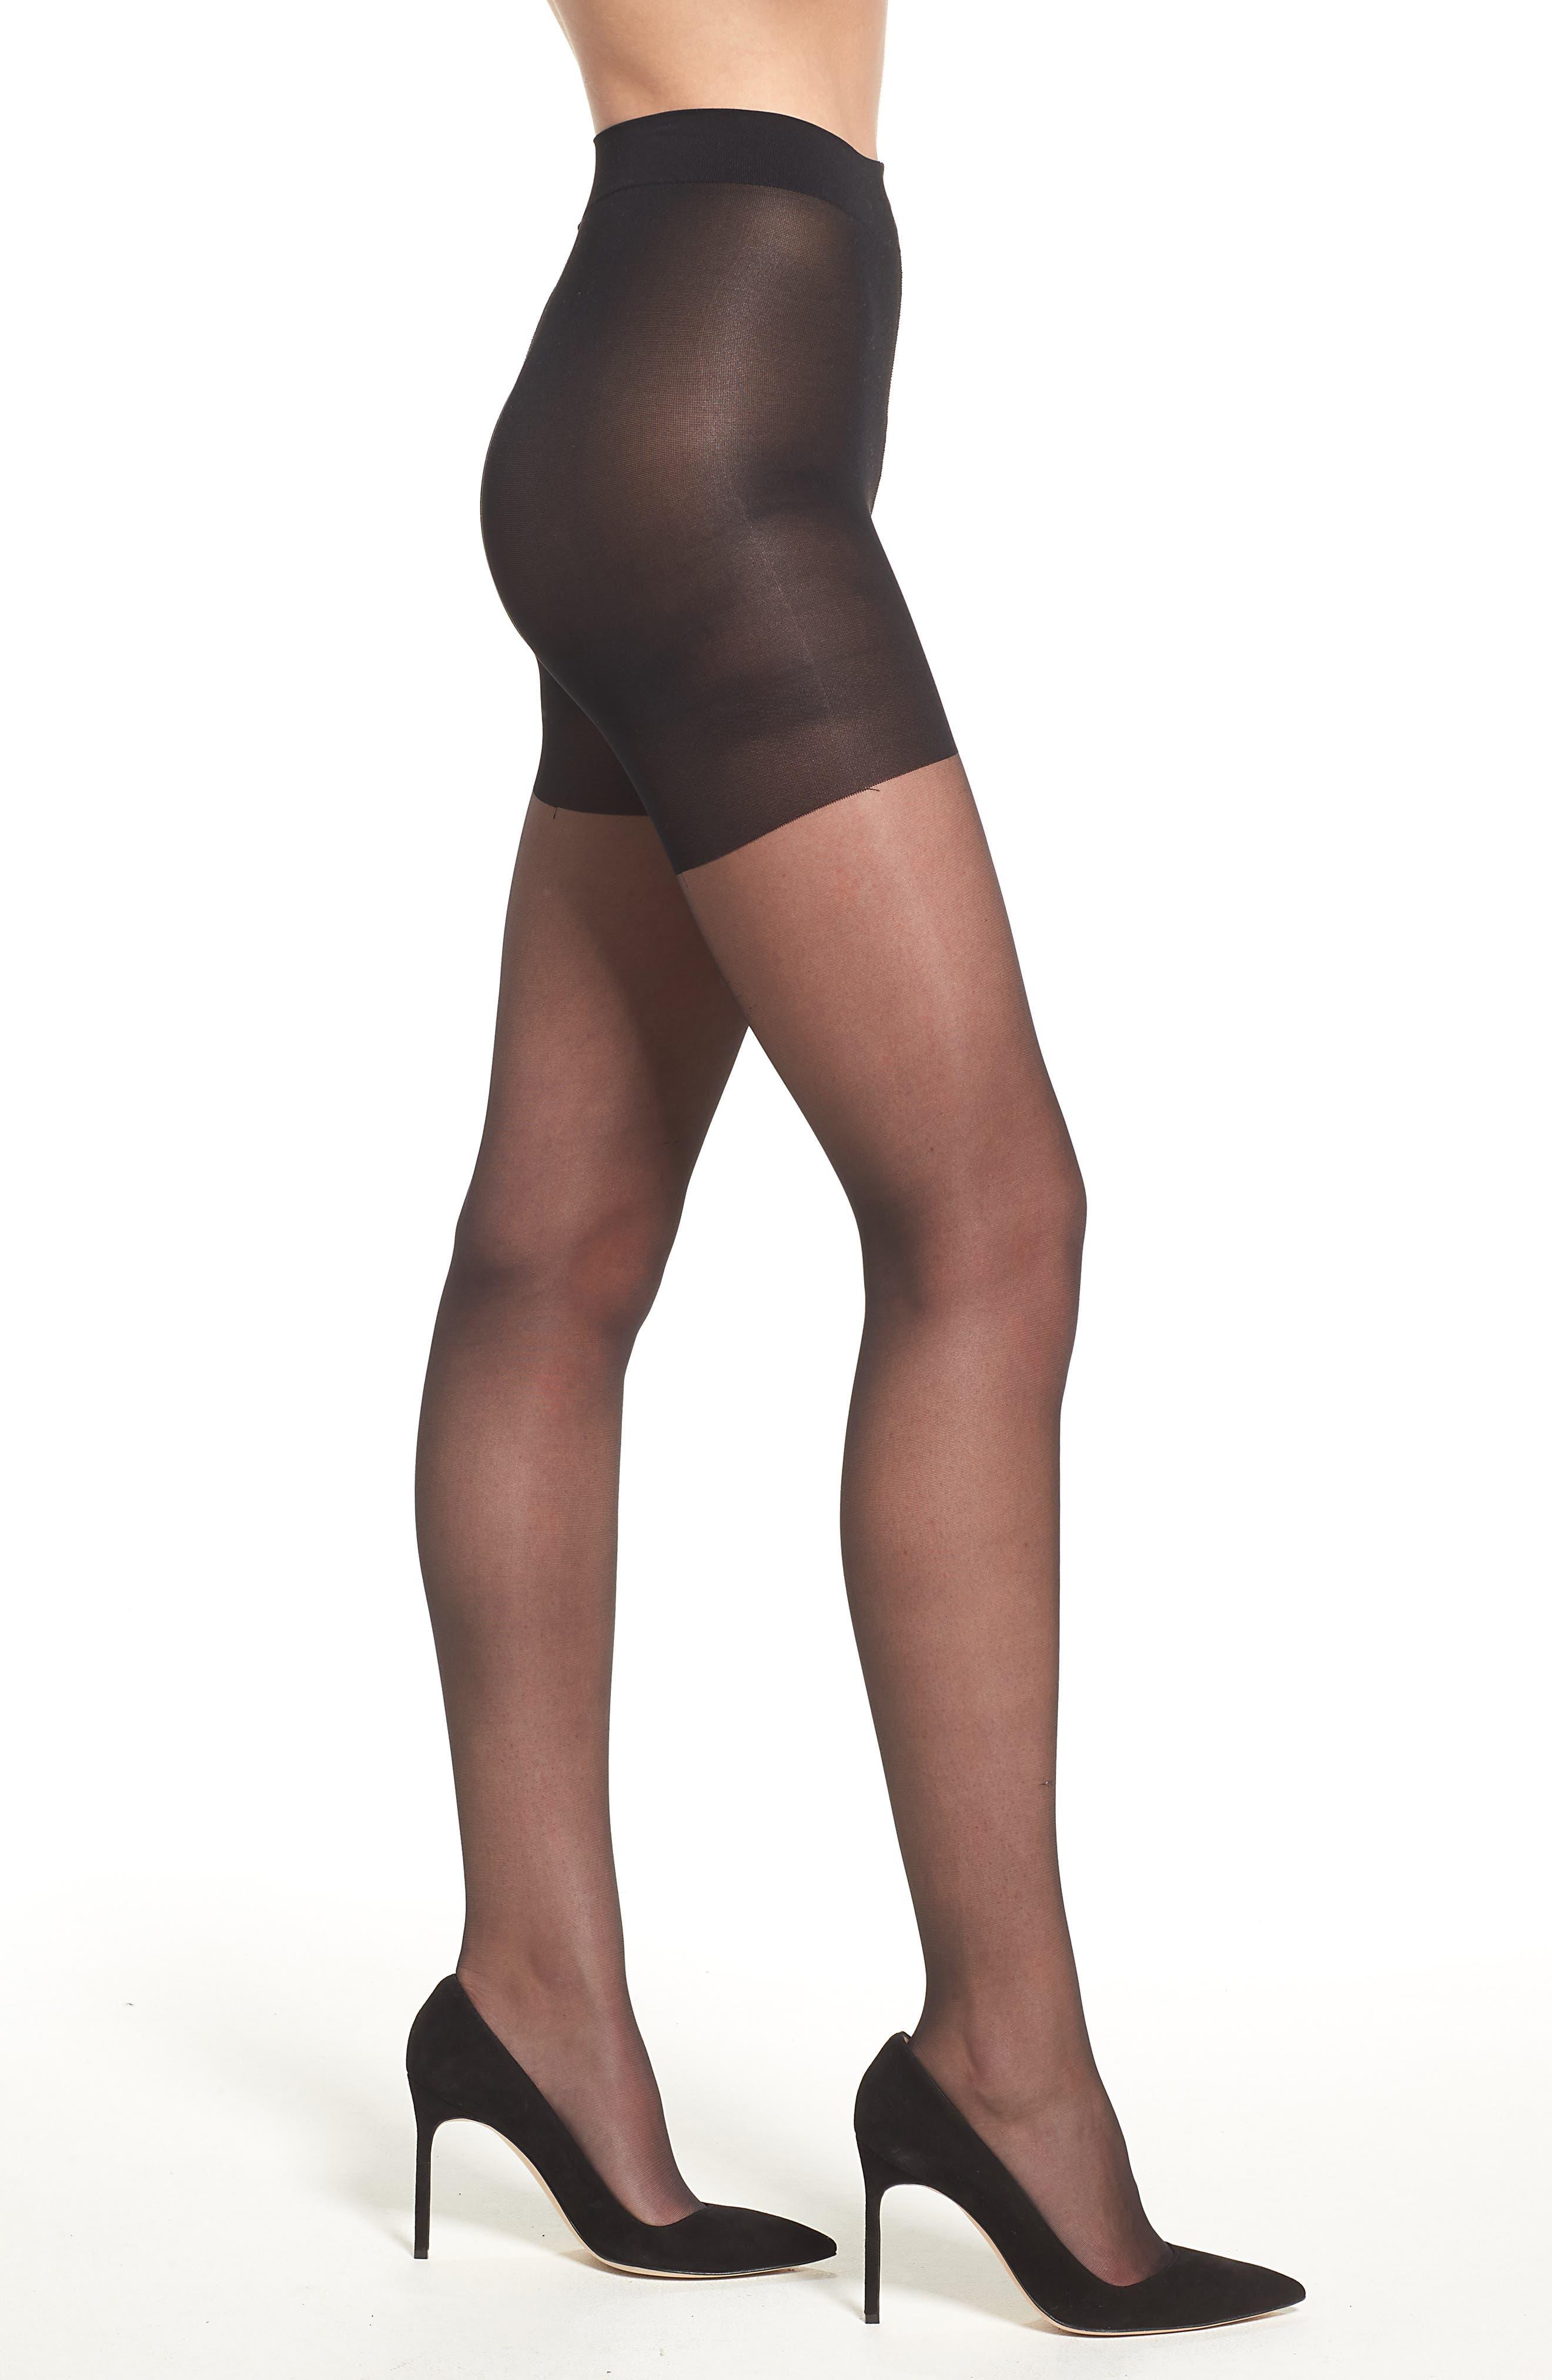 Sheer Control Top Pantyhose,                         Main,                         color, BLACK